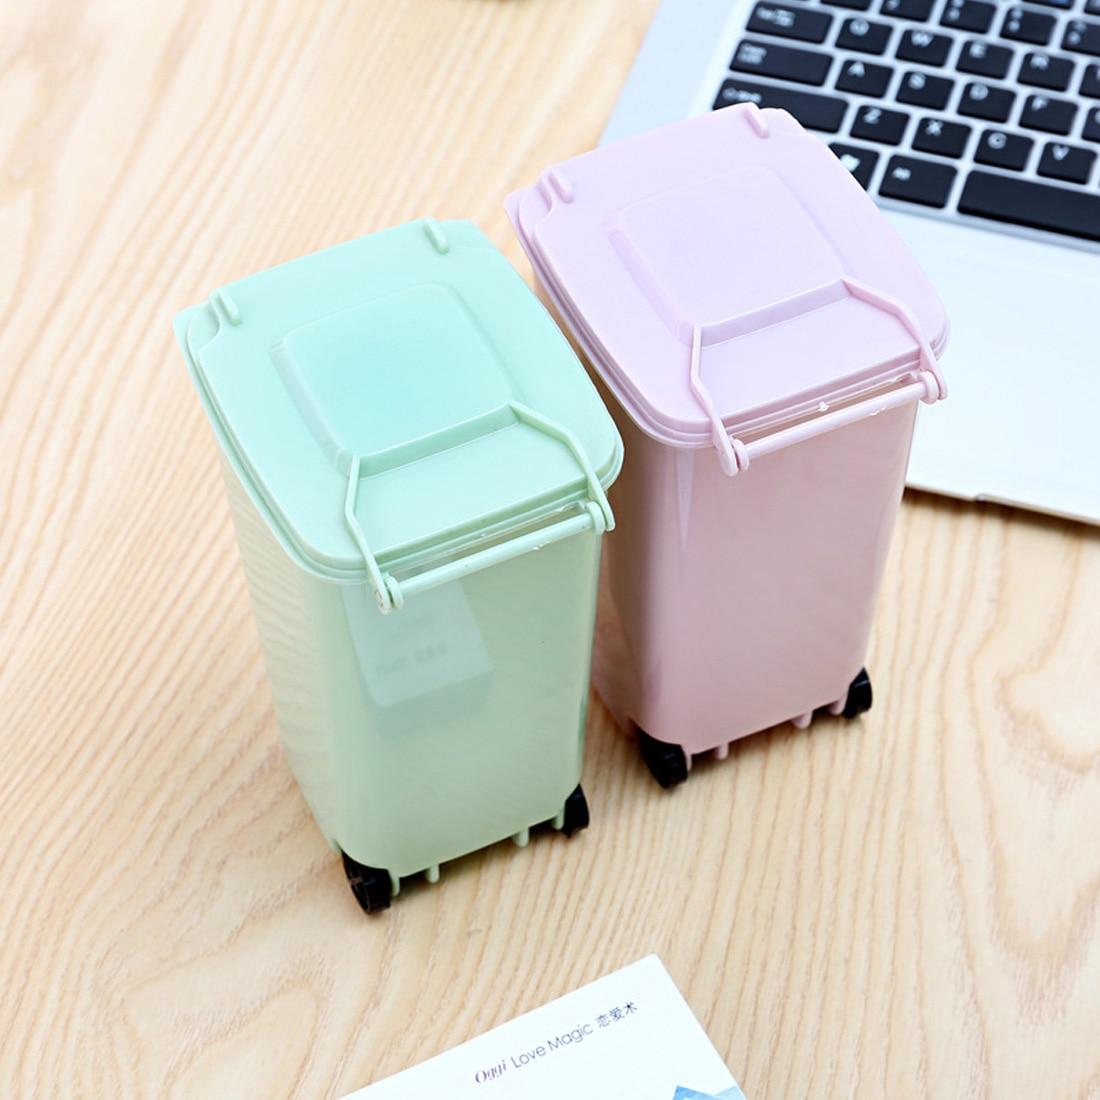 1 Pc Mini Portátil para Lixo Lixo Lixo Pode Escritório Acessórios de Decoração Criativa Multi-funcional de Armazenamento De Limpeza De Resíduos De Lixo